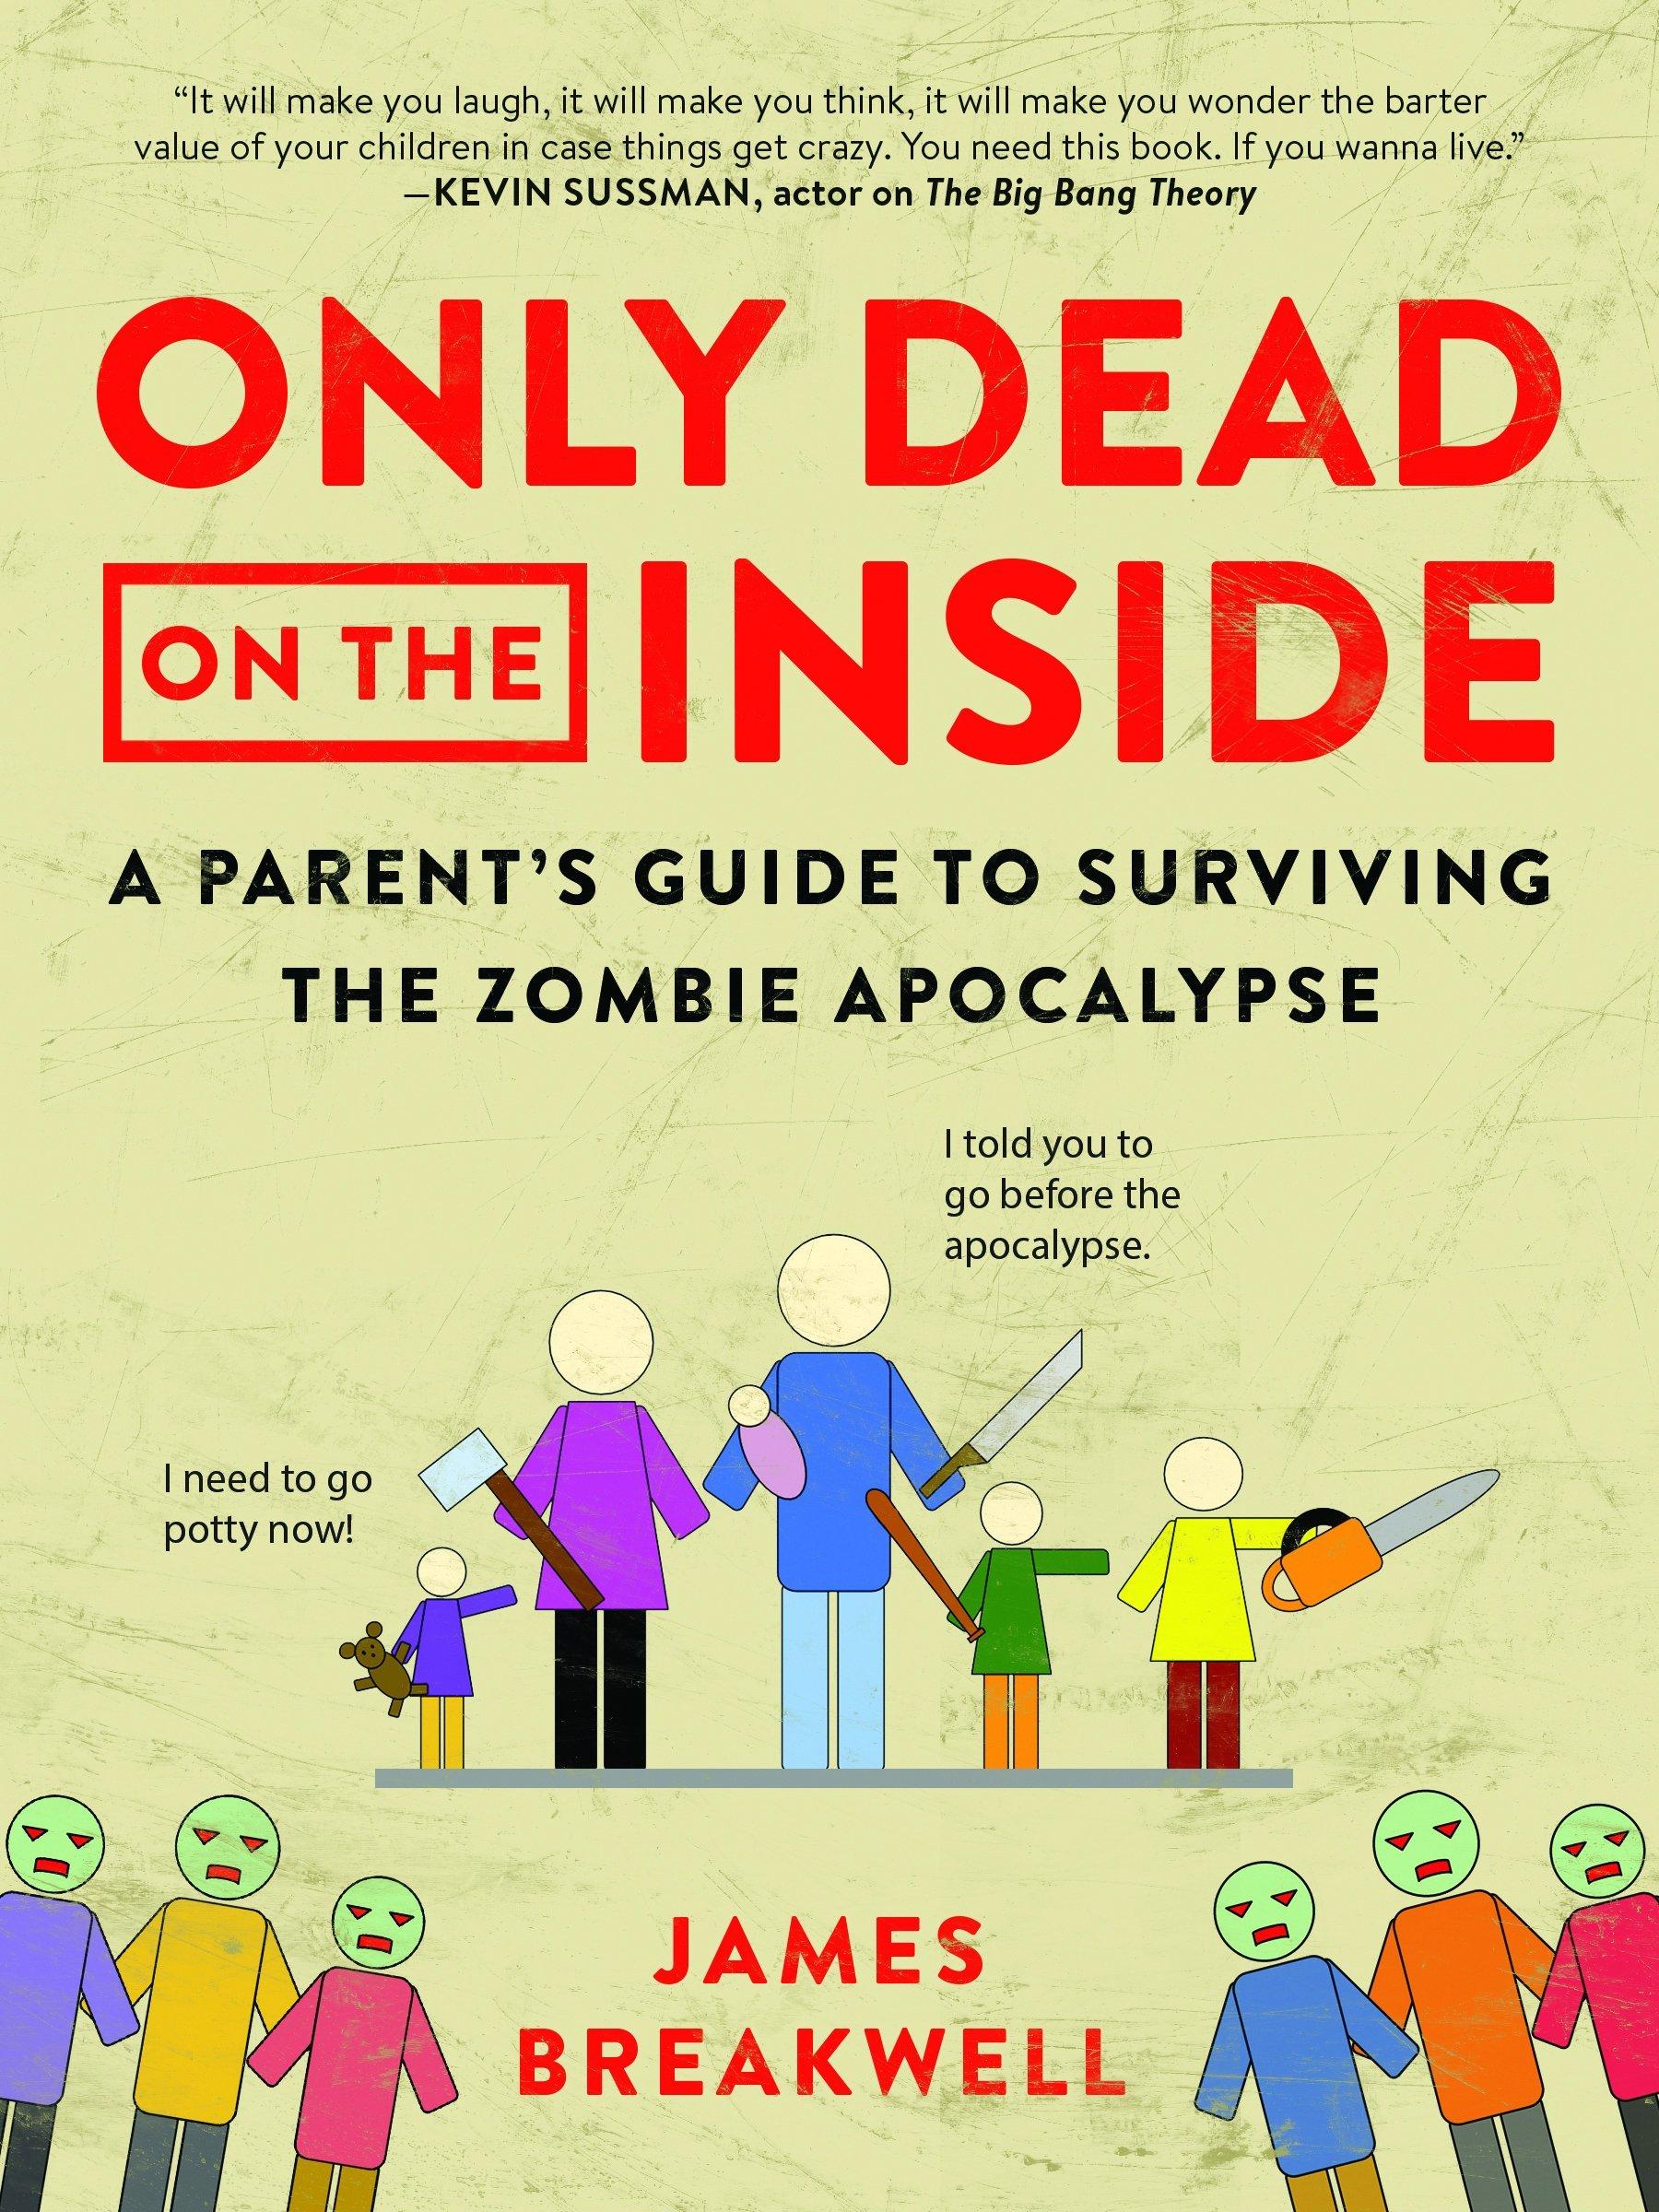 Parents need help during the zombie apocalypse,